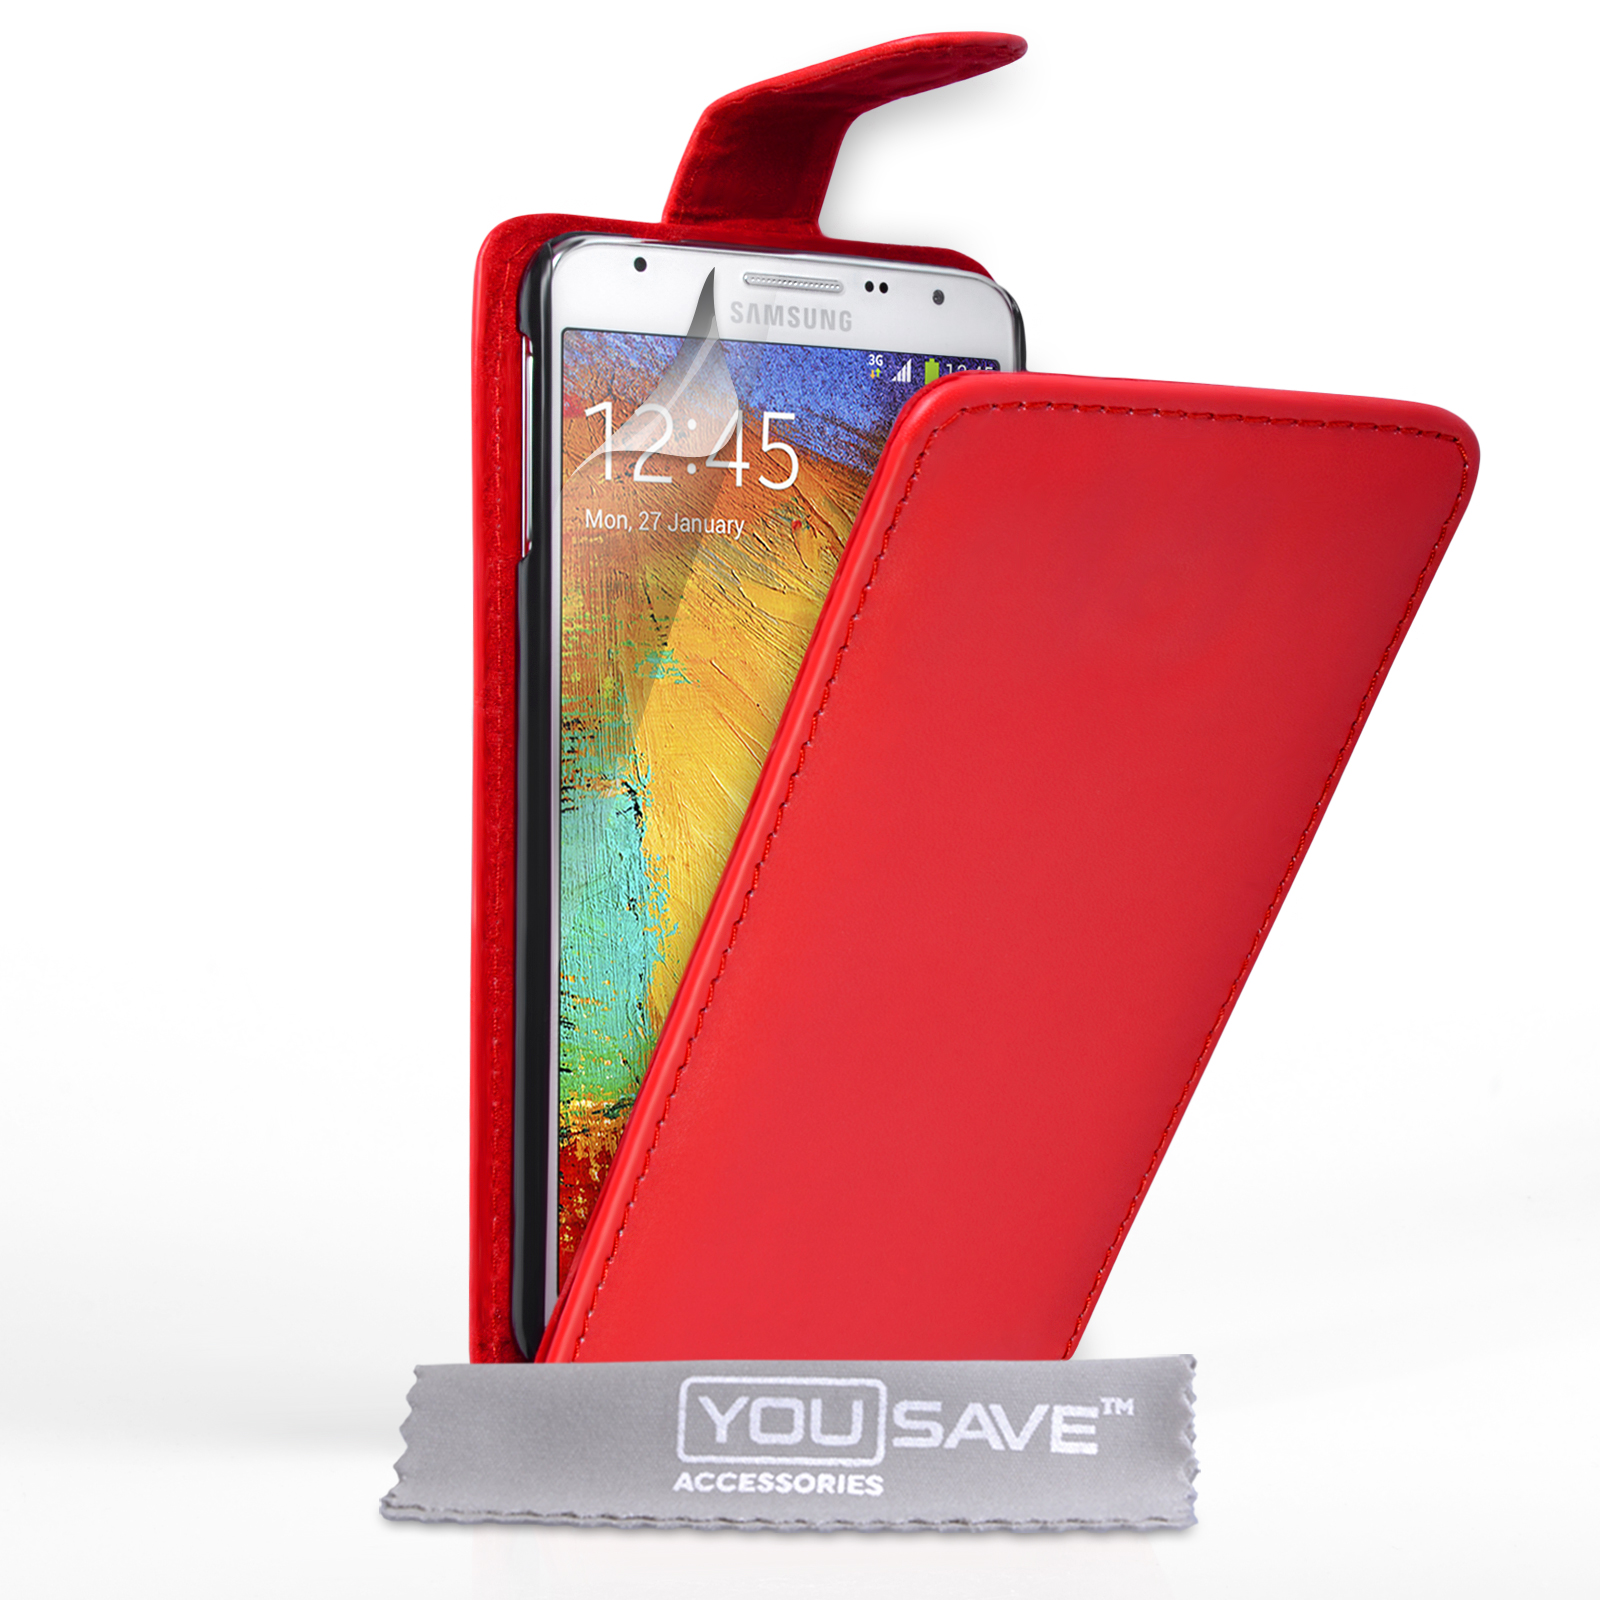 Flip Θήκη Samsung Galaxy Note 3 Neo by YouSave (Z660)